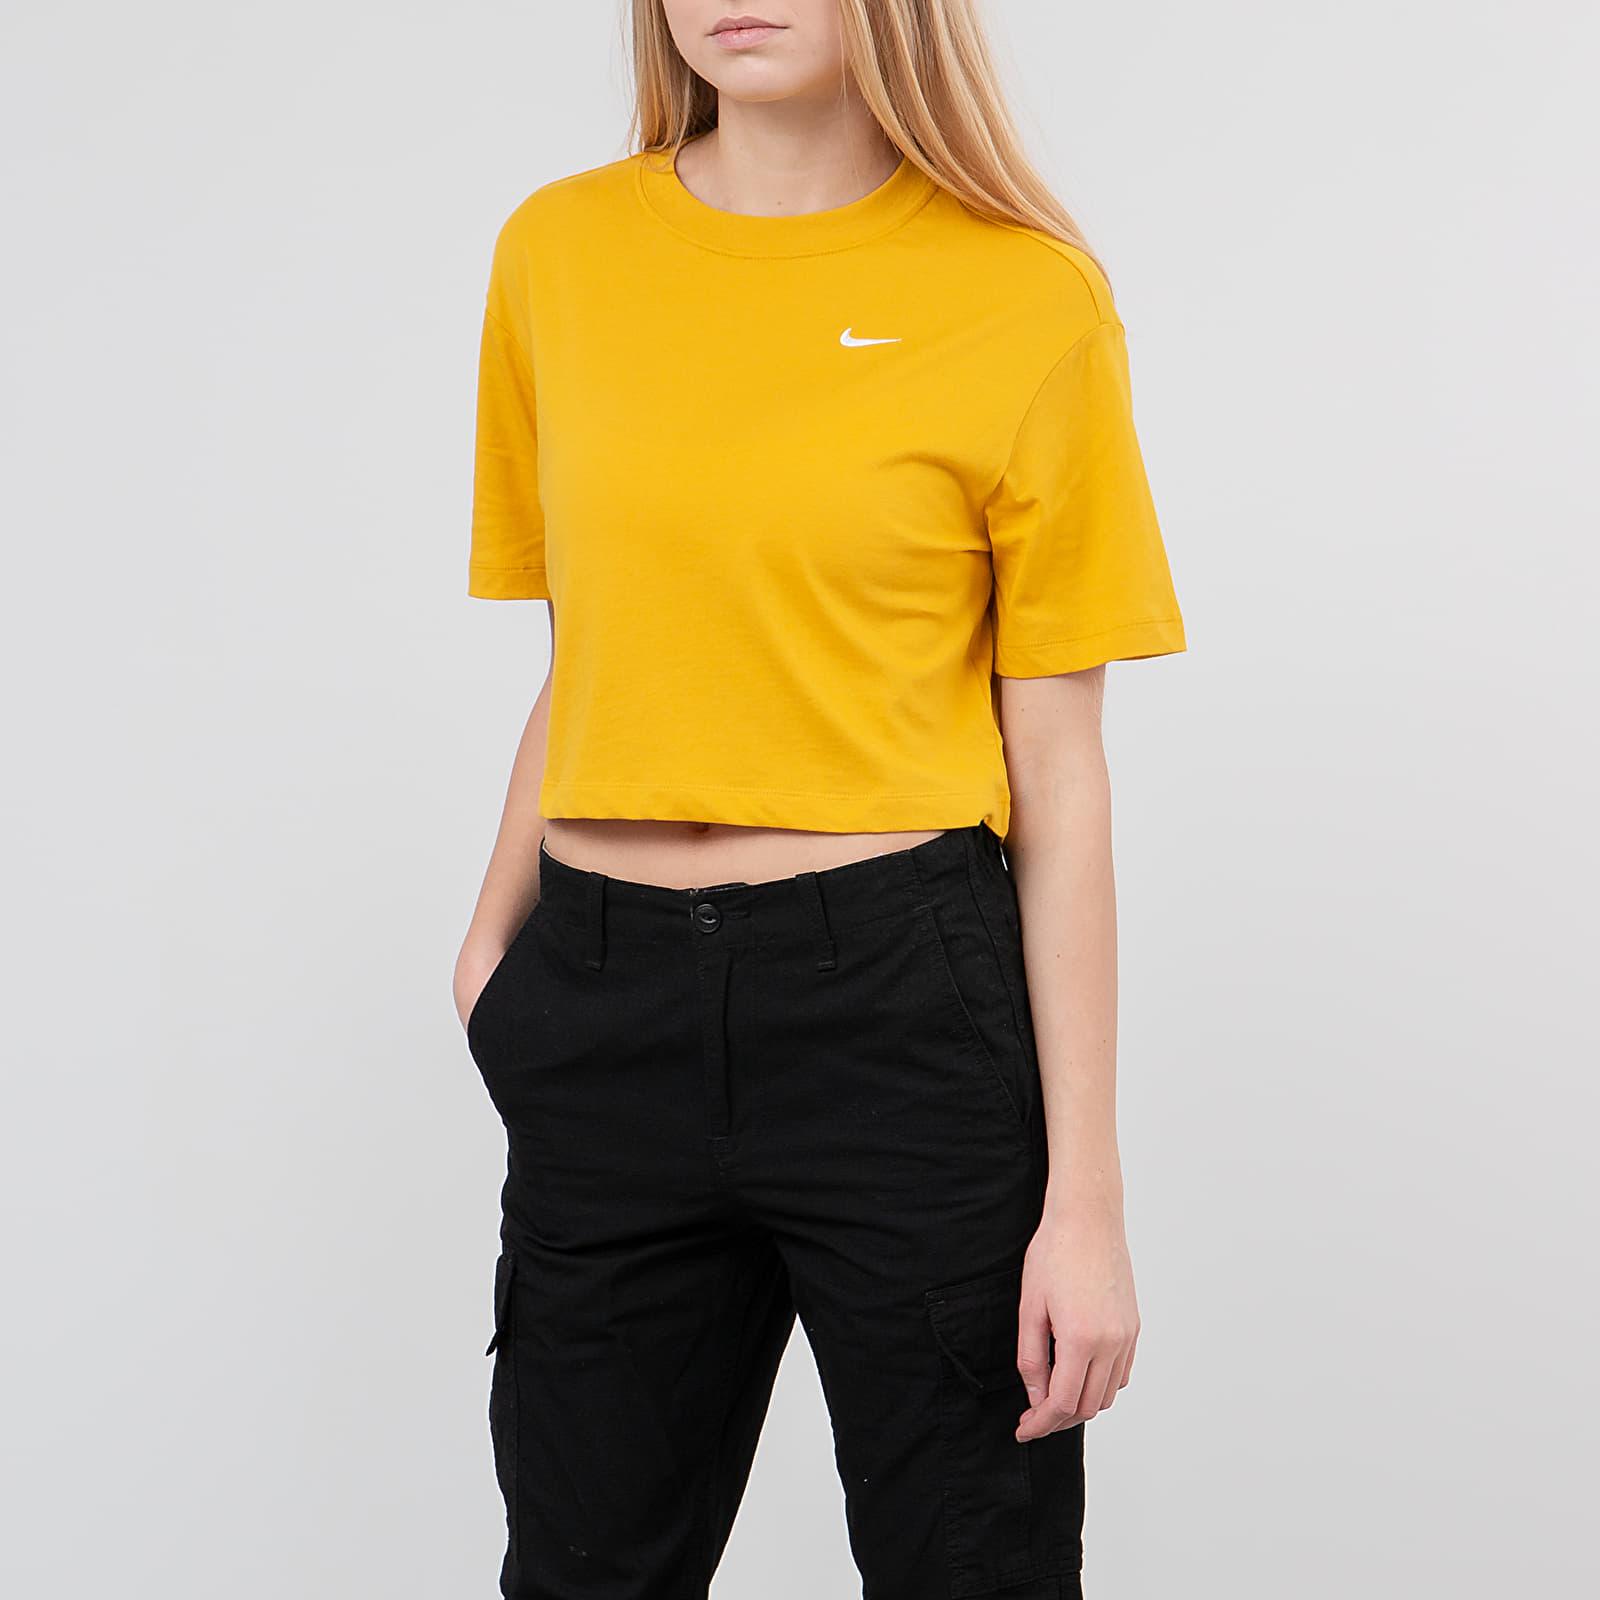 Nike Sportswear Essential Top